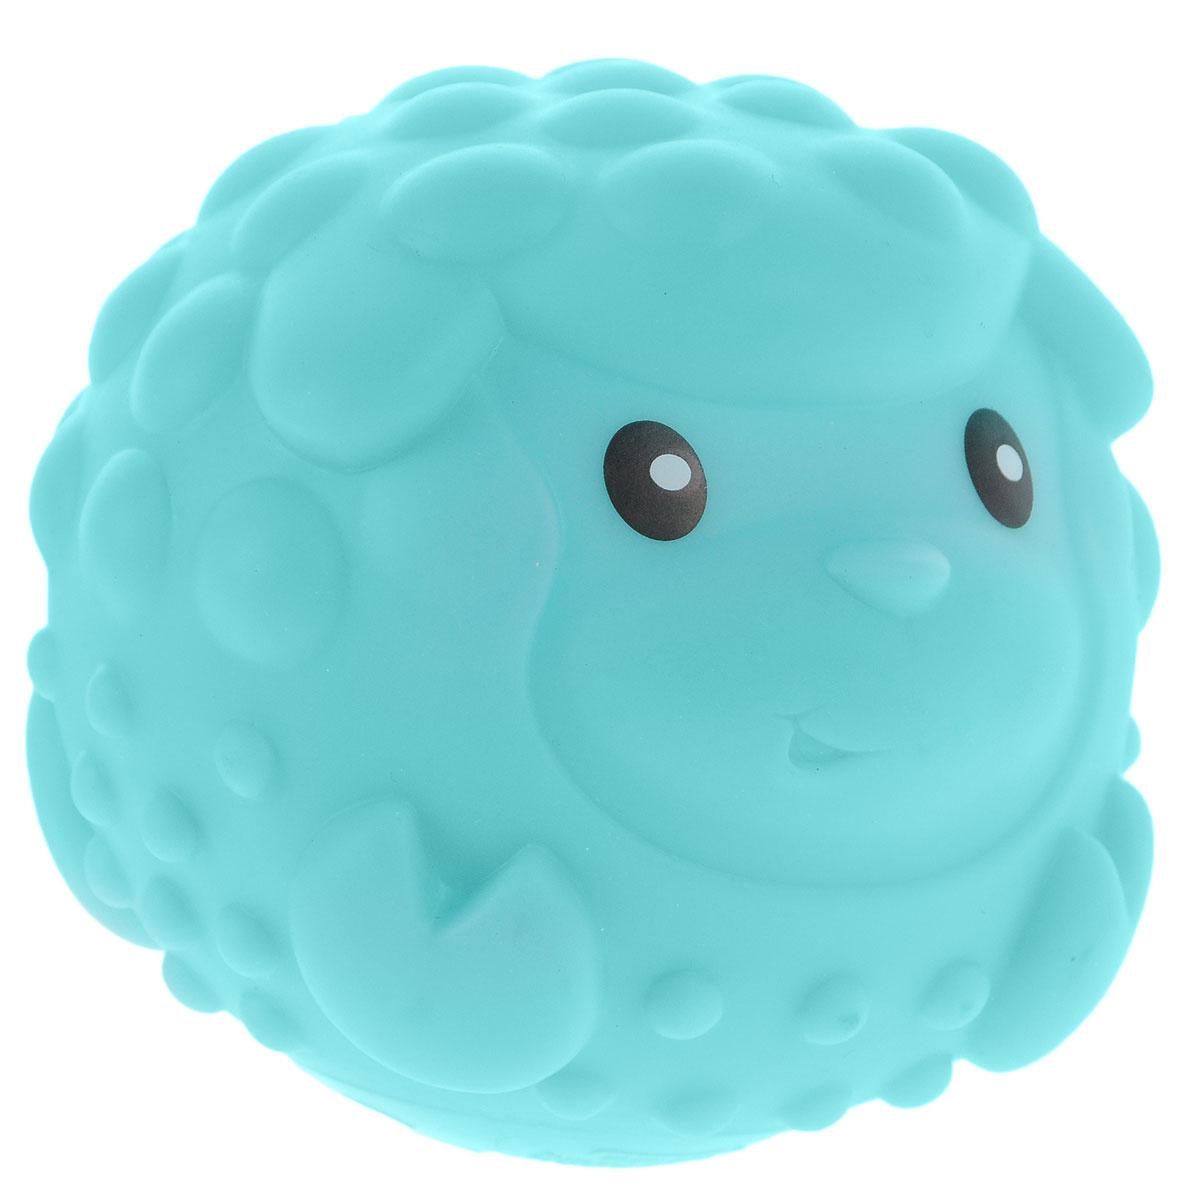 B kids Развивающая игрушка-пищалка Овечка #1